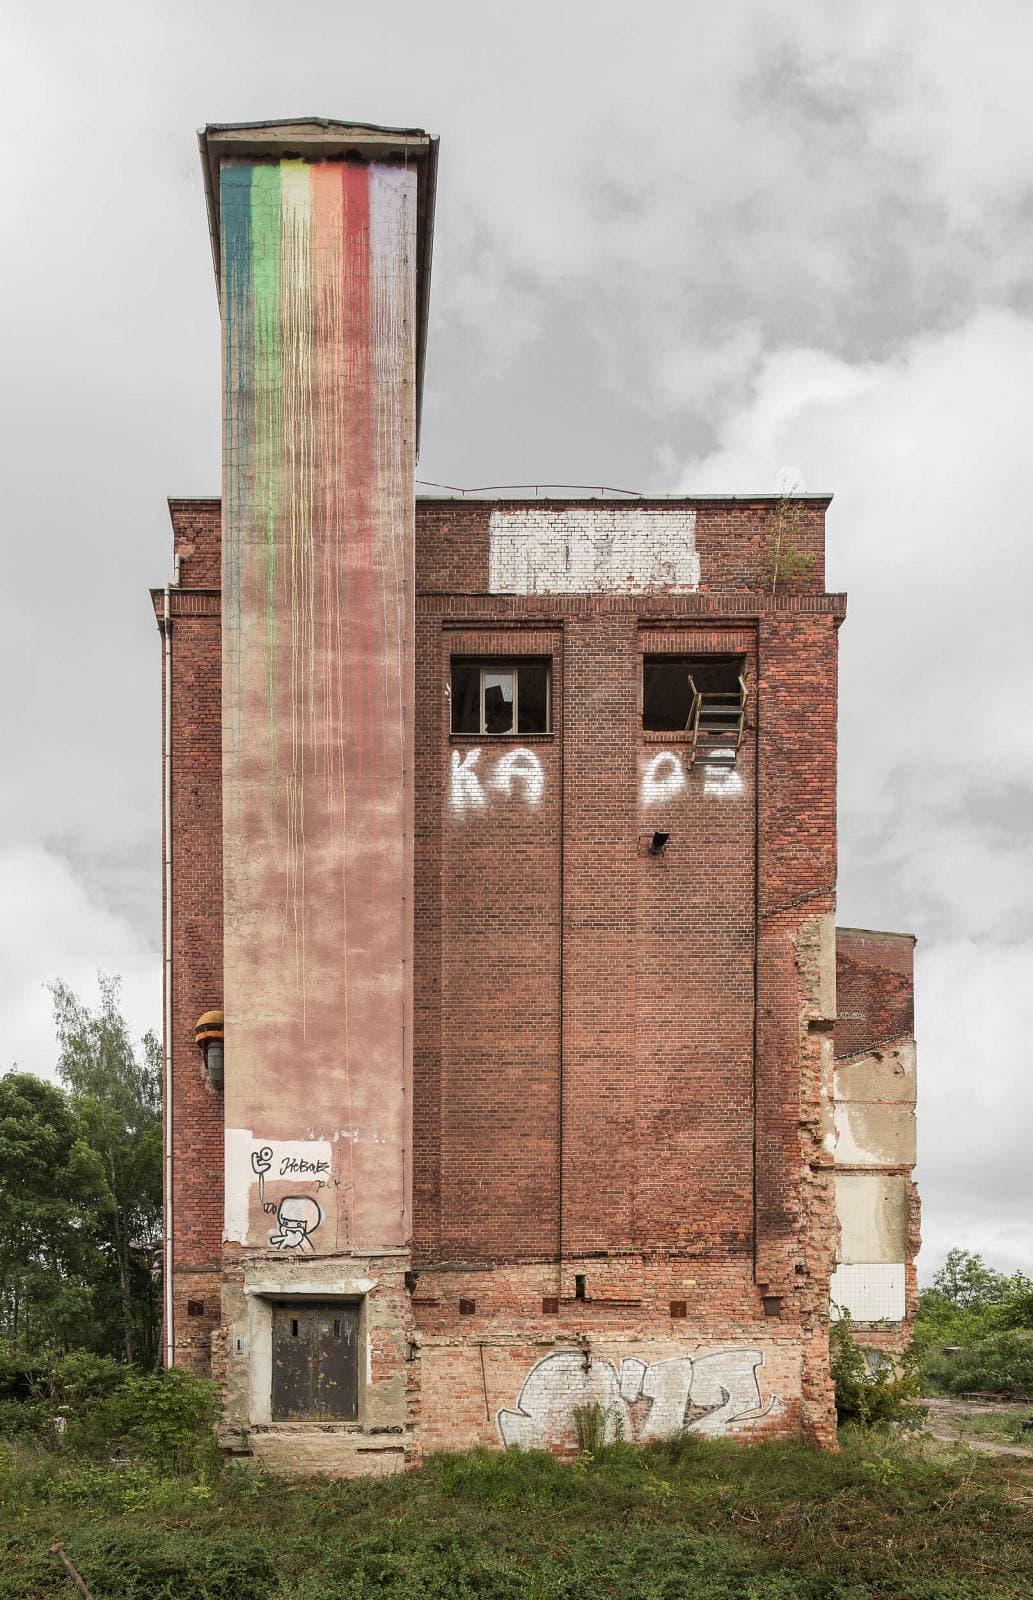 Regentaucher Architekturfotografie | Awaiting Leipzig Swiderski Süd